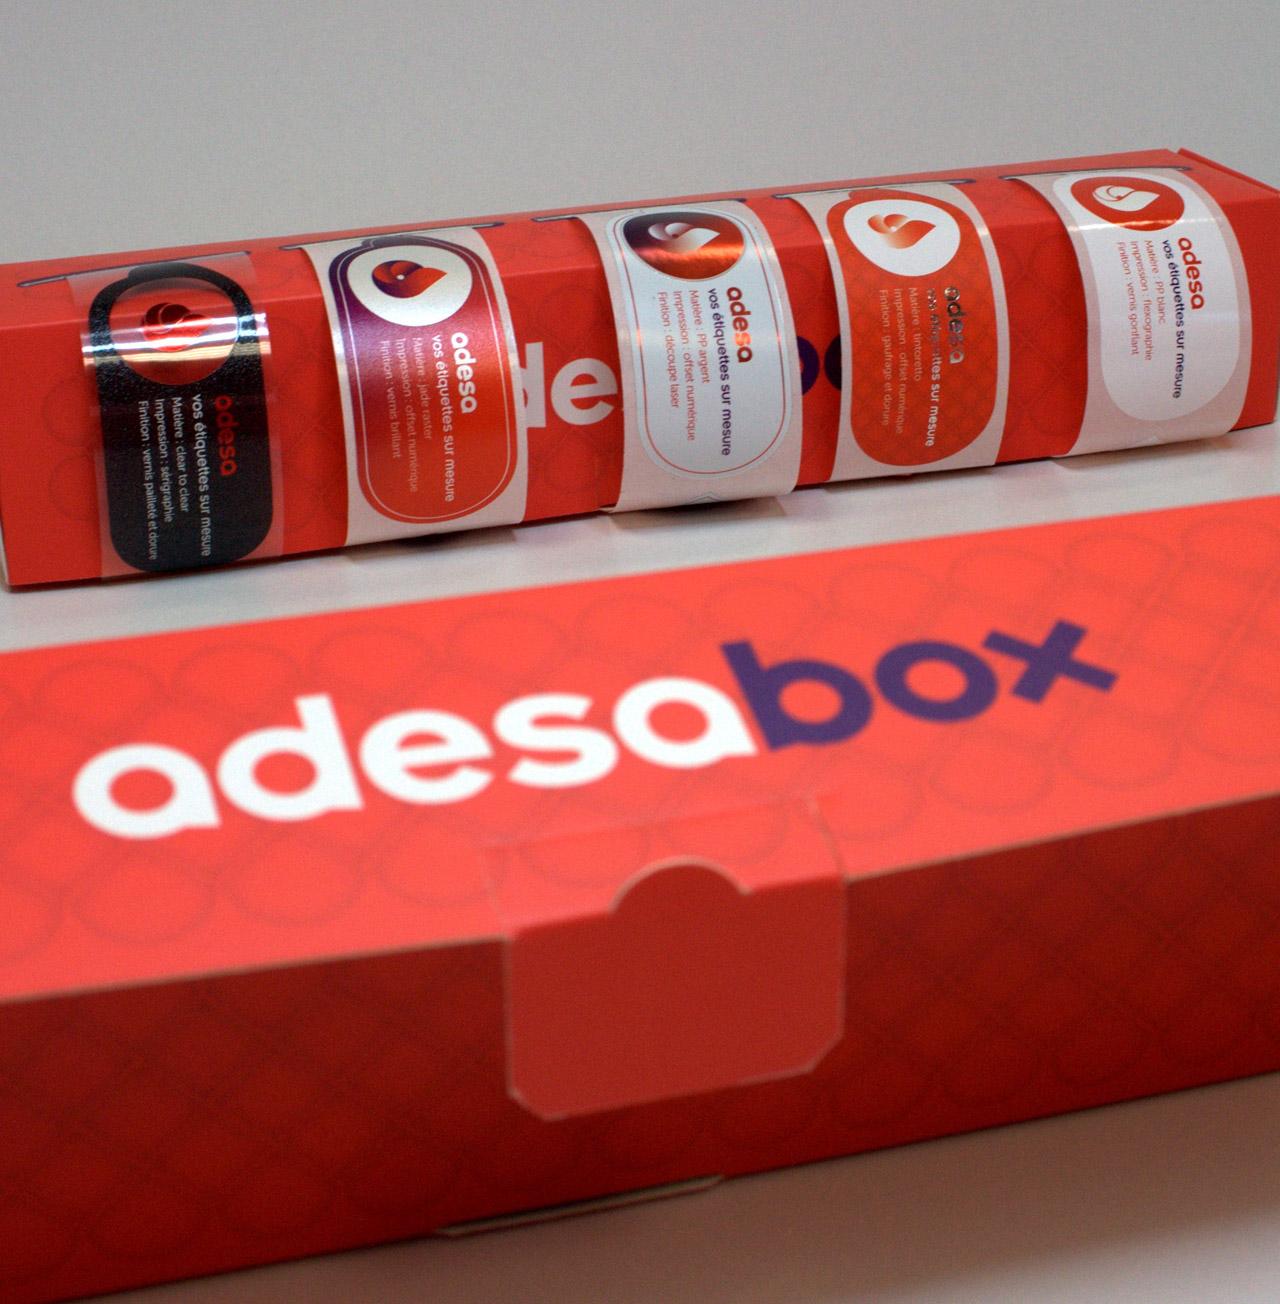 adesa-creation-packaging-etiquettes-caconcept-alexis-cretin-1